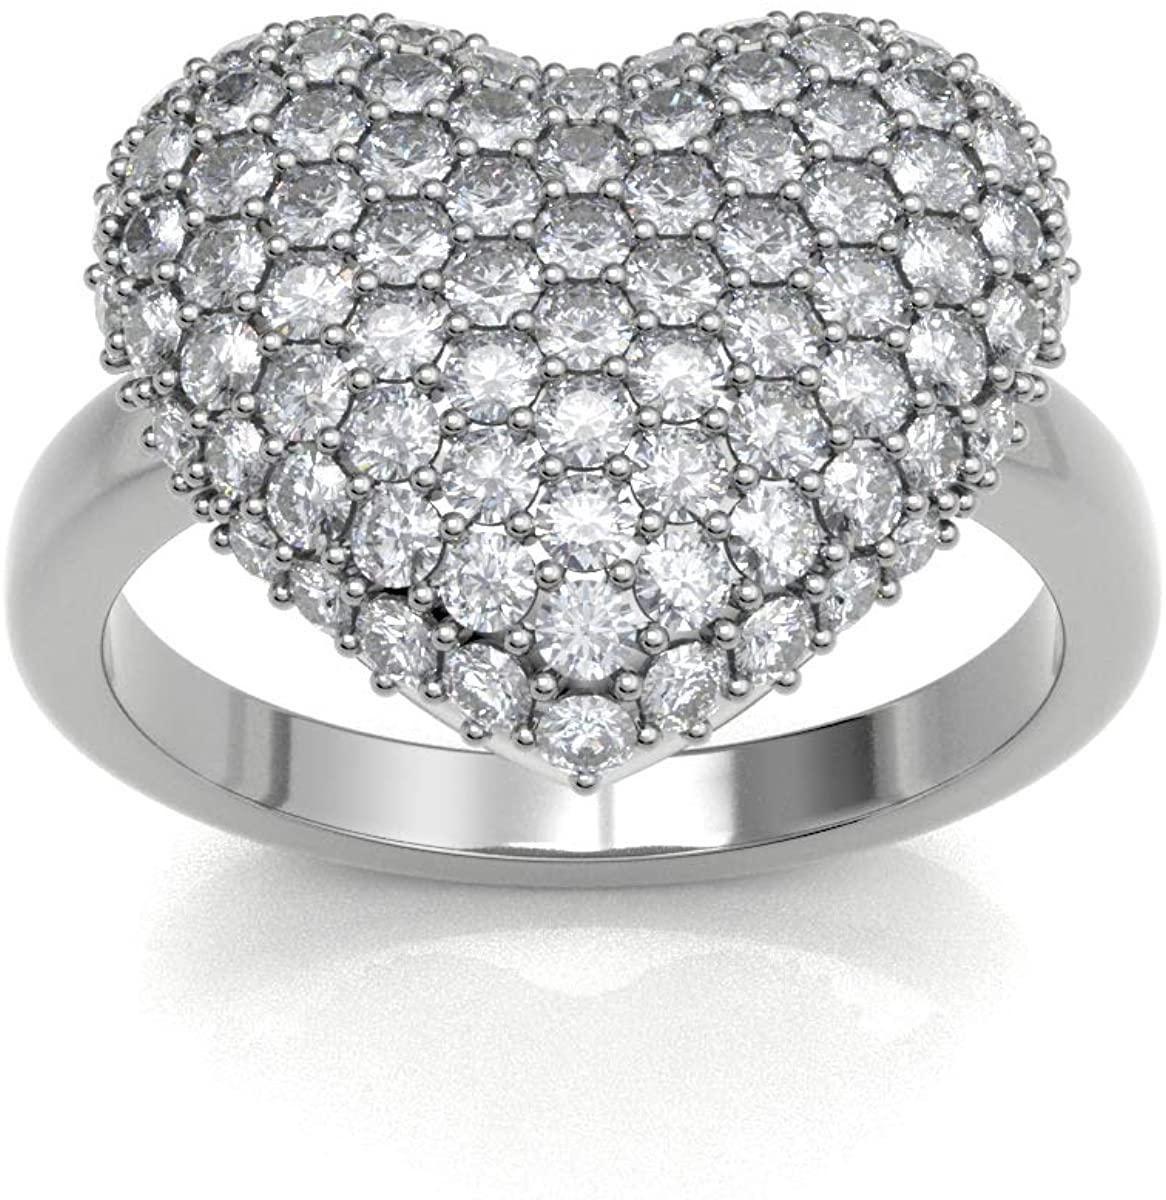 JewelsForum 2 – 3 Carat Diamond 14k White Gold 1.00cts Cluster Diamond Heart Engagement Ring for Women Art Deco Bee Hive Design Wedding Anniversary Marriage Love Band